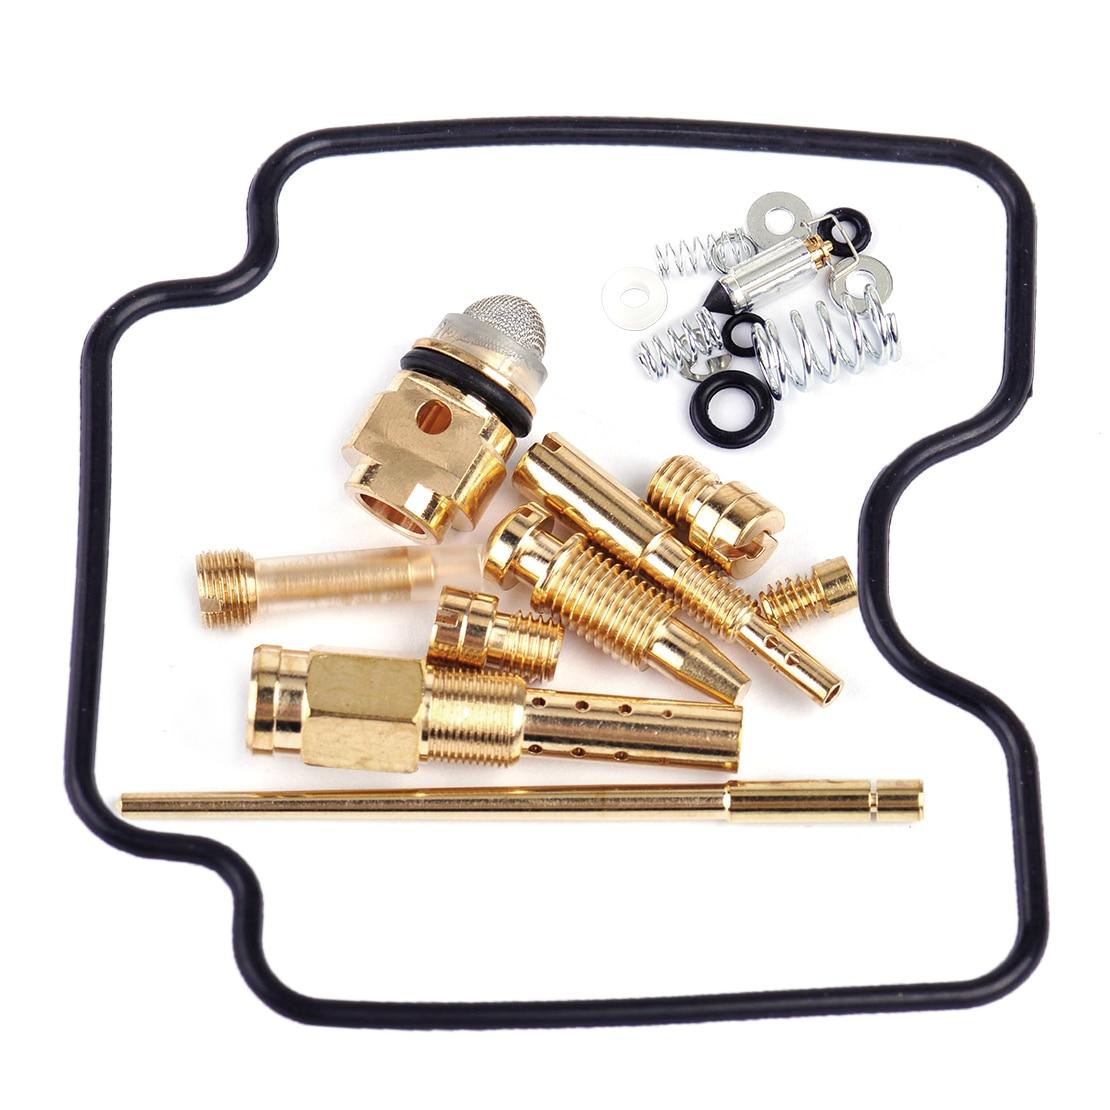 dwcx 22x carburetor carb repair rebuild kit easy. Black Bedroom Furniture Sets. Home Design Ideas